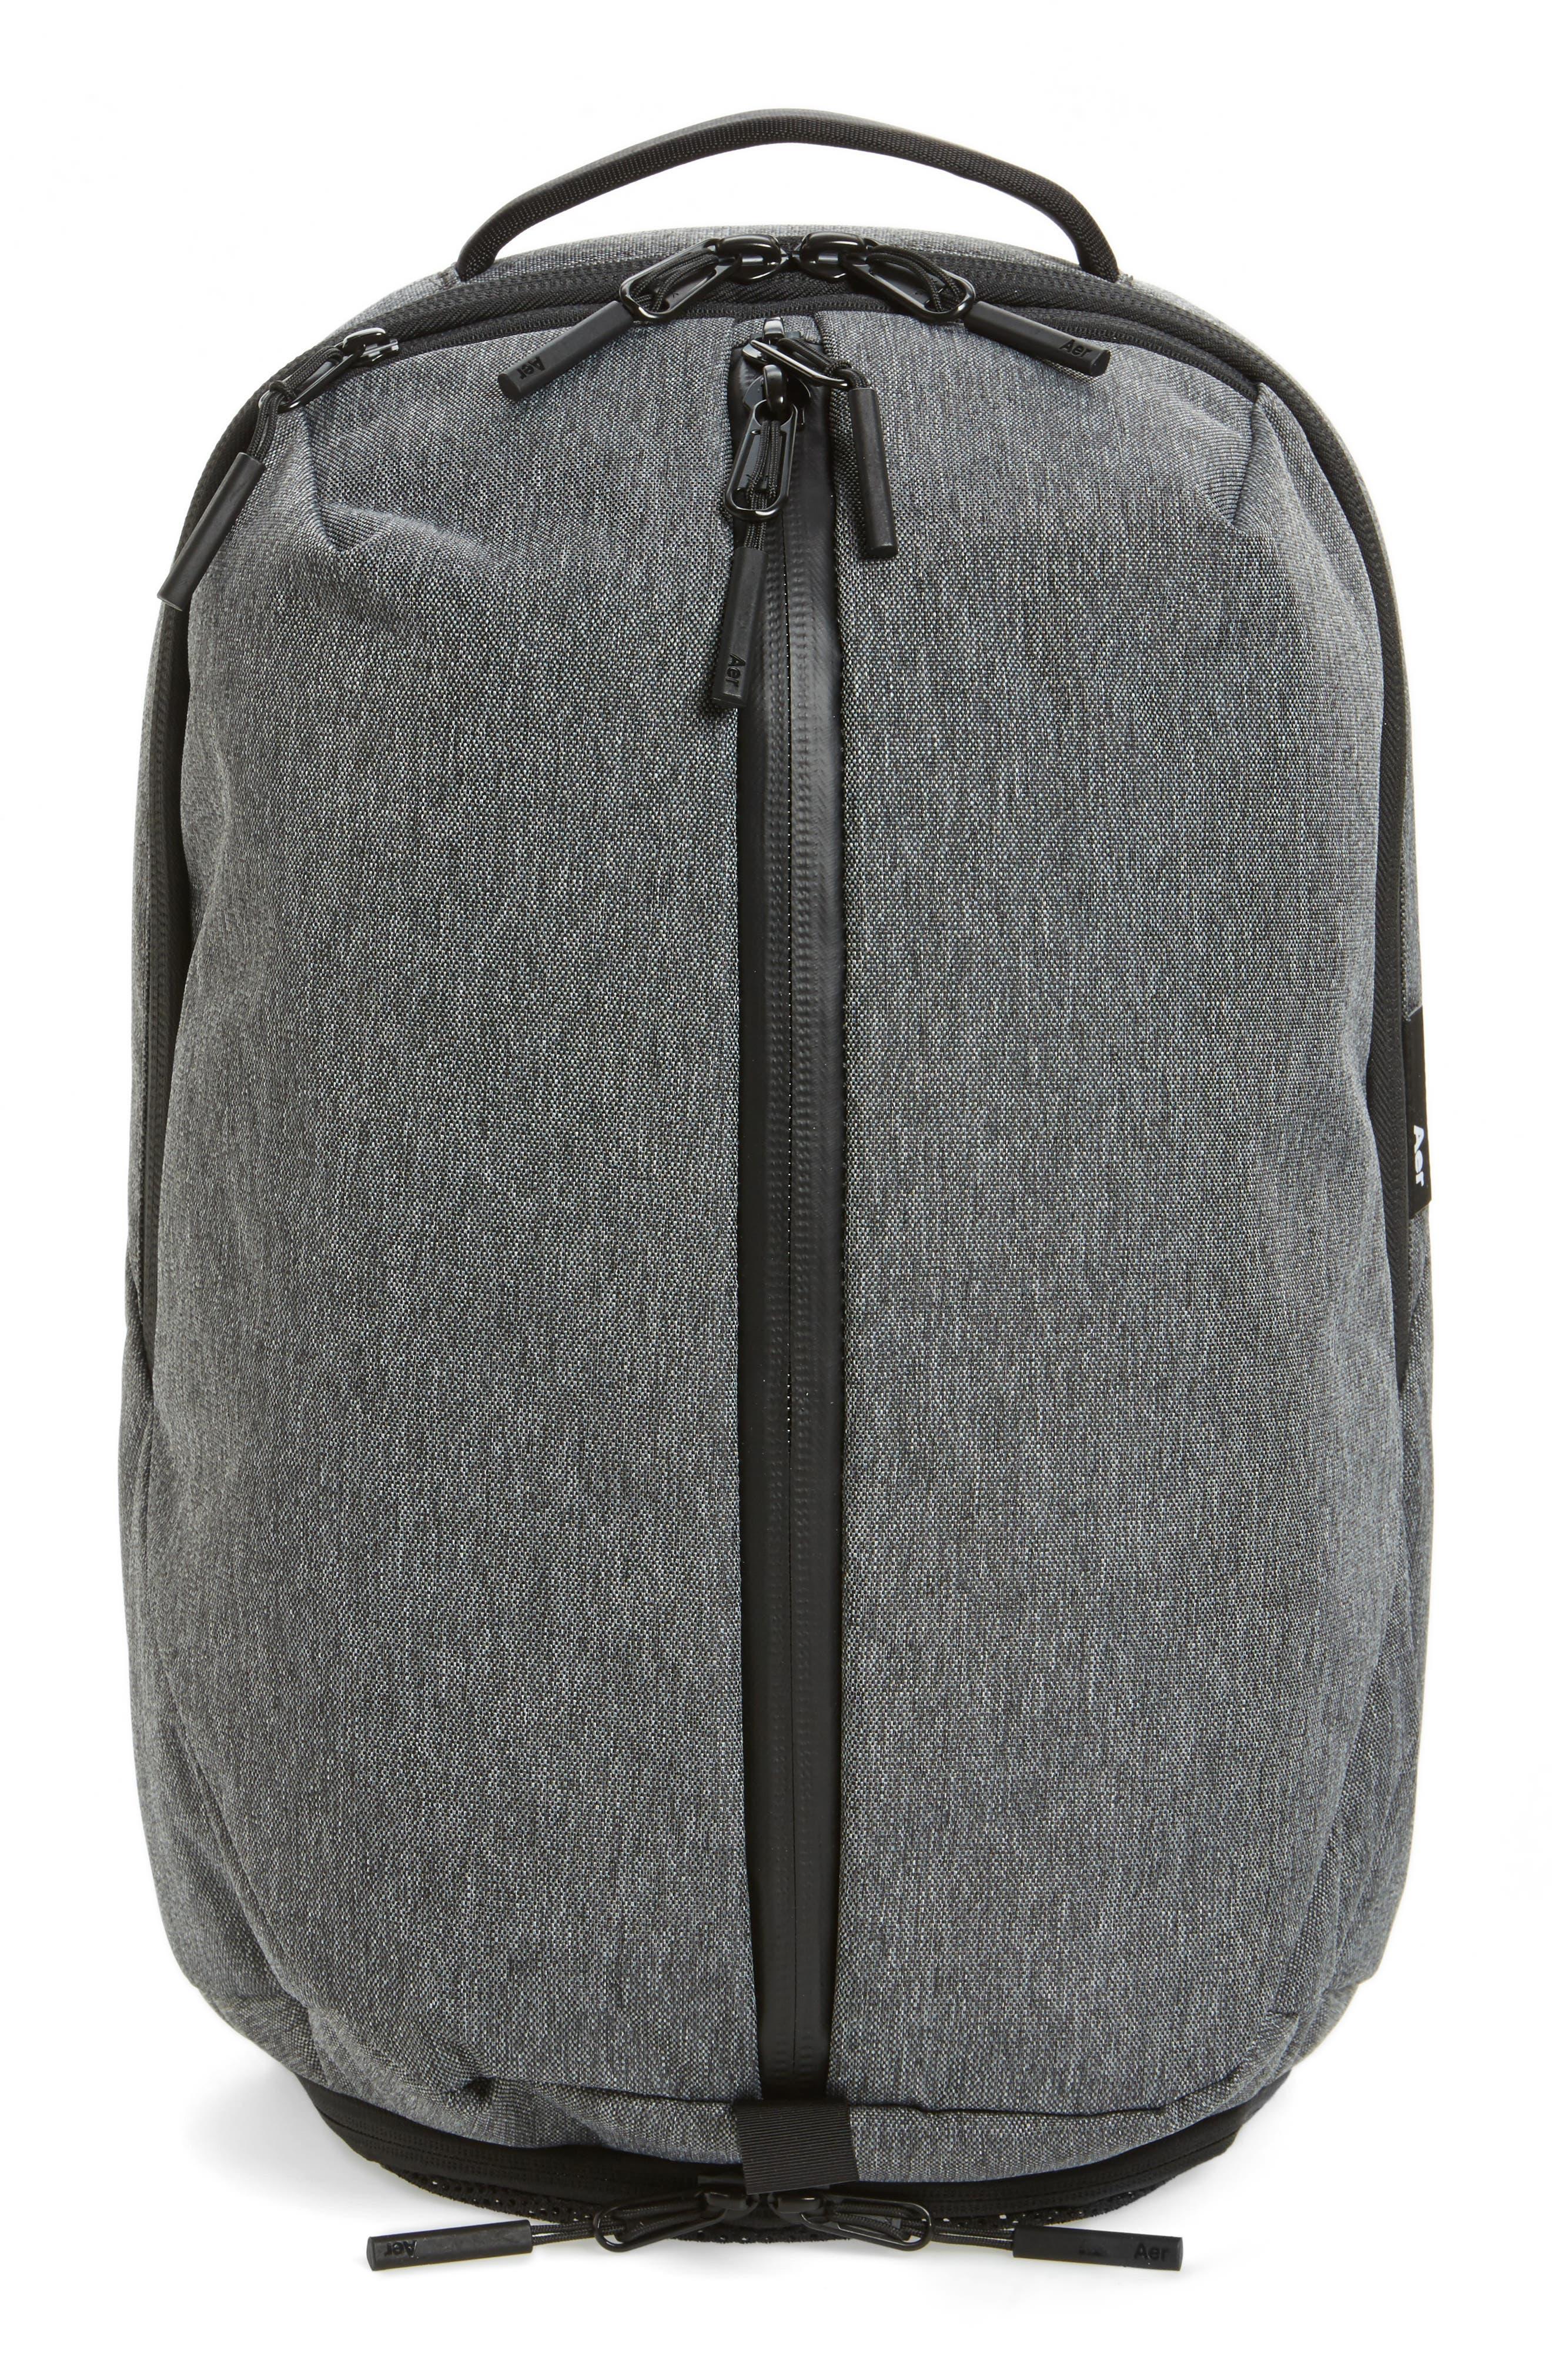 Alternate Image 1 Selected - Aer Fit Pack 2 Backpack